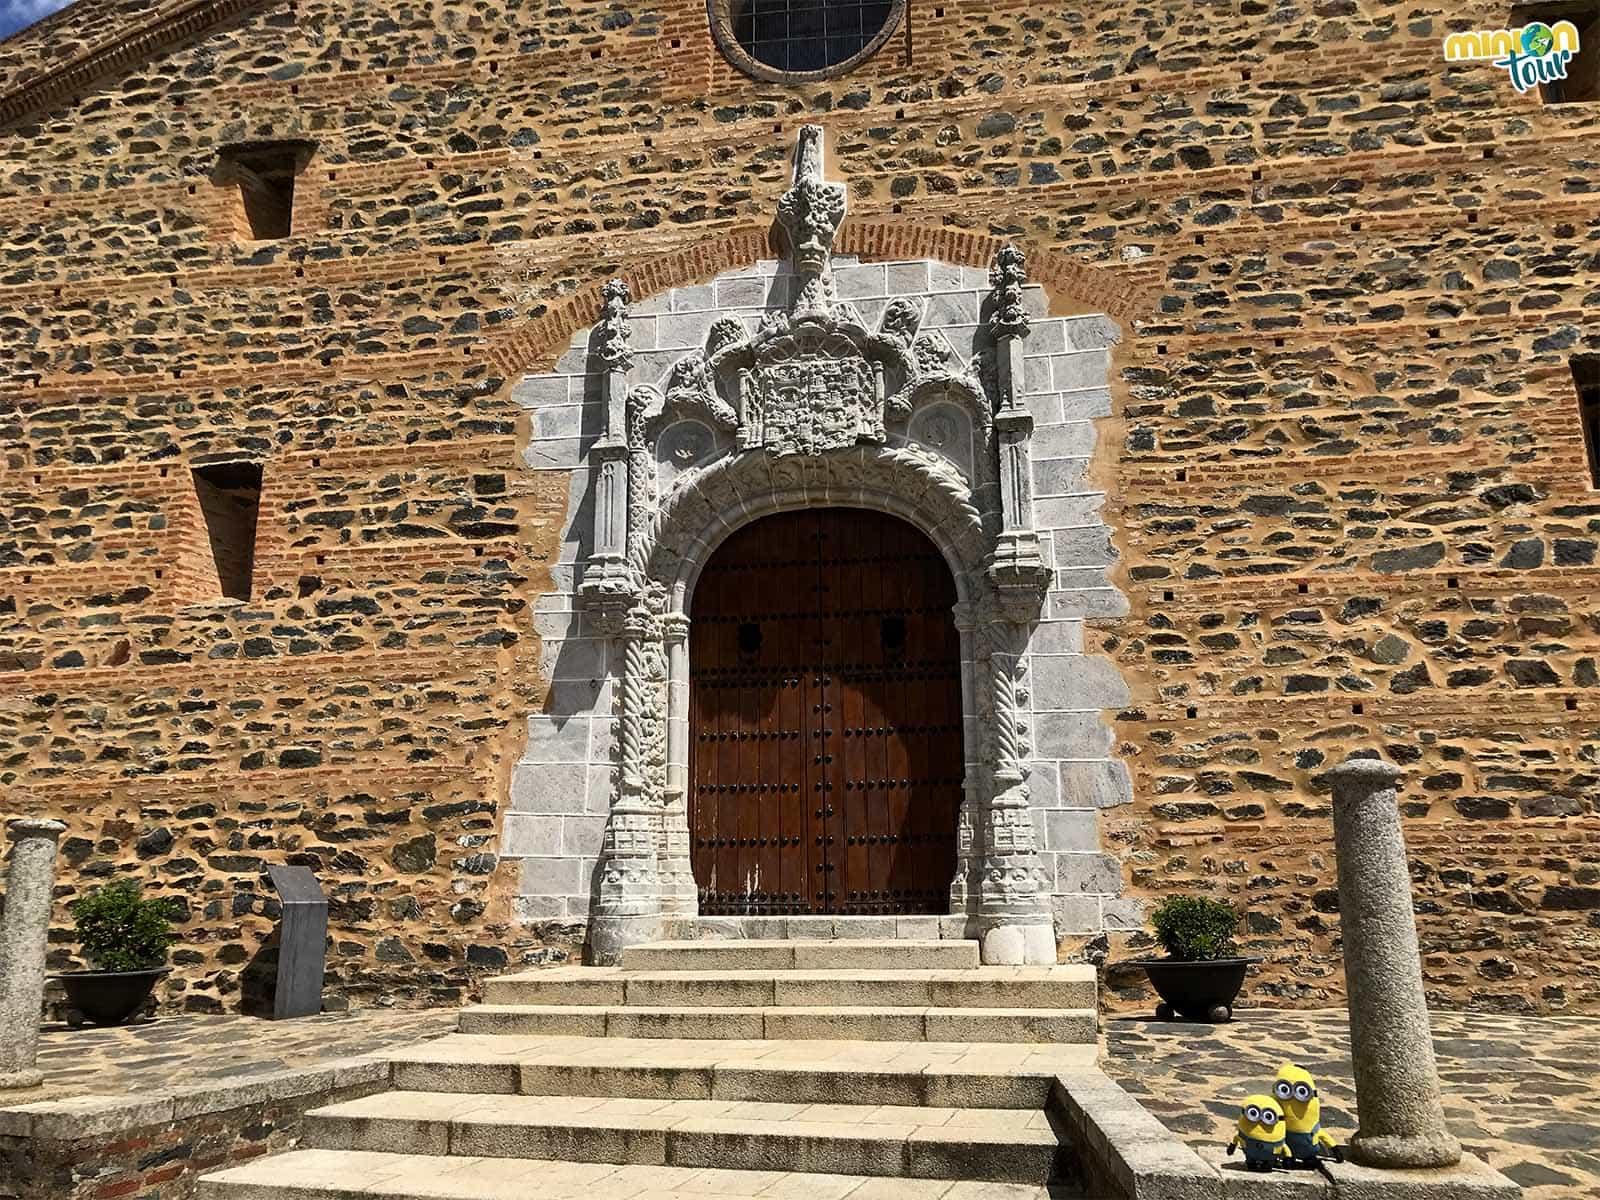 Puerta de entrada a la Iglesia gótico mudéjar de San Martín